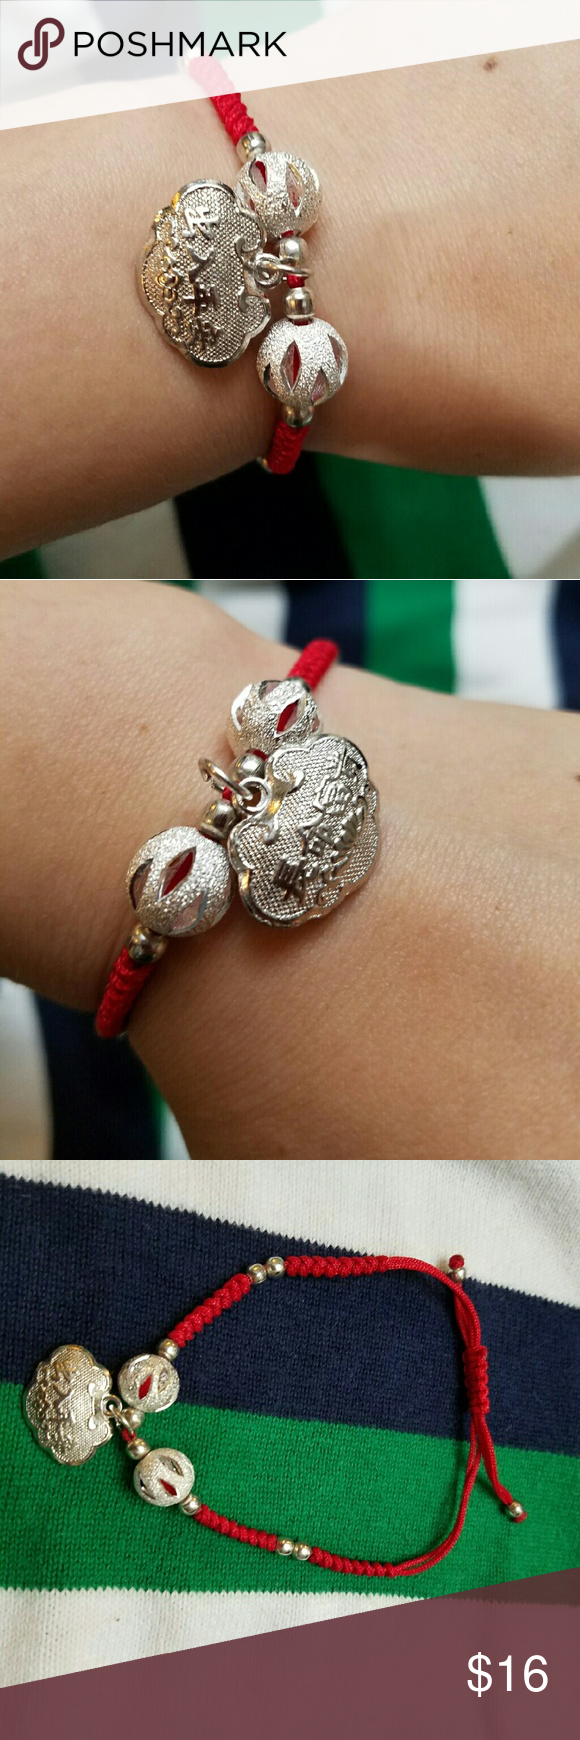 925 sterling silver baby adjustable bracelet NWT | My Posh Closet ...